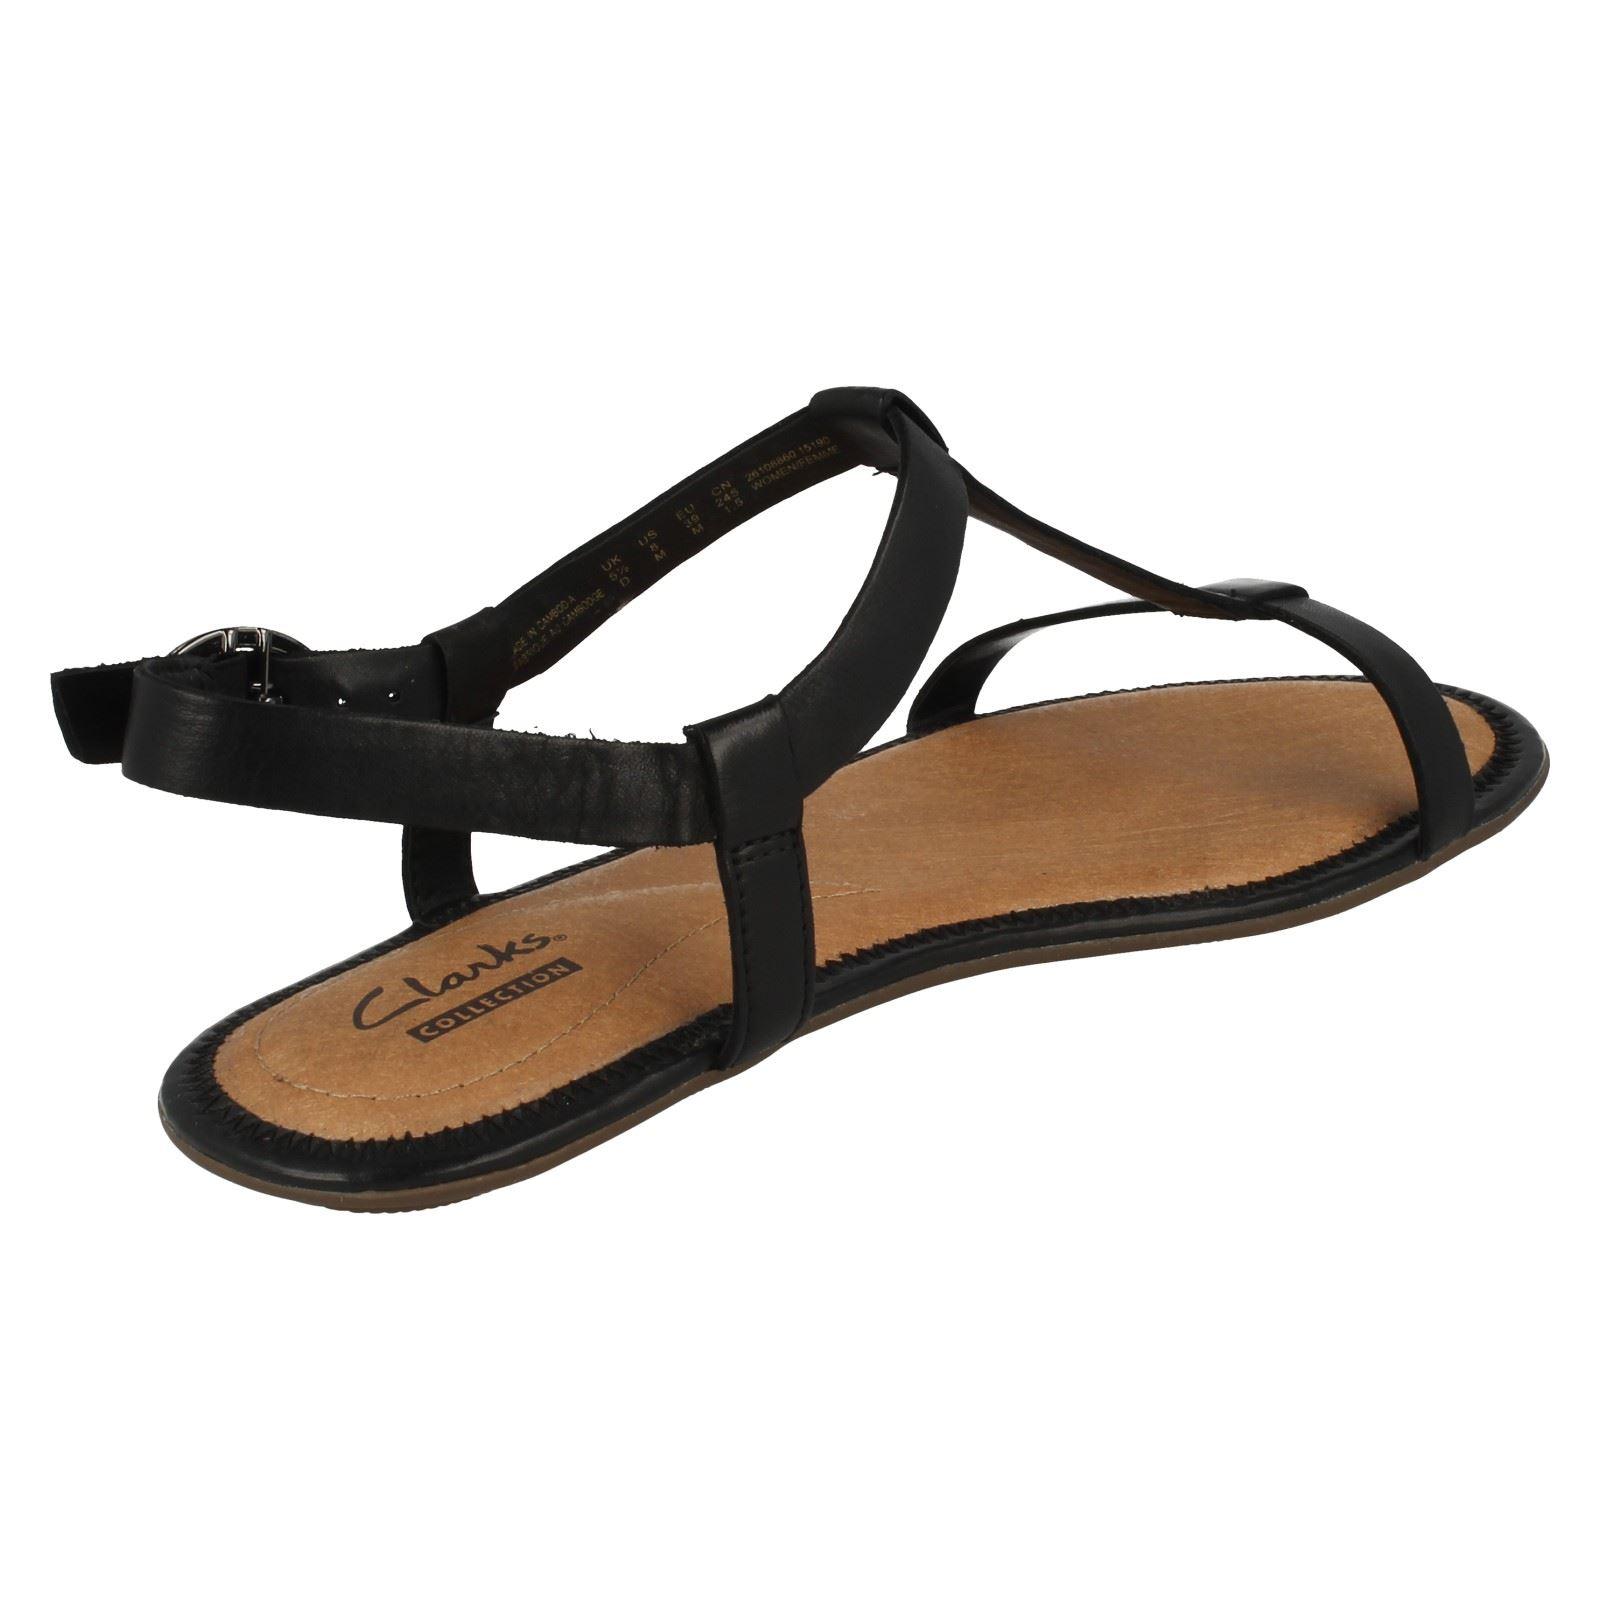 Ladies Clarks Strap Sandals Risi Hop Ebay